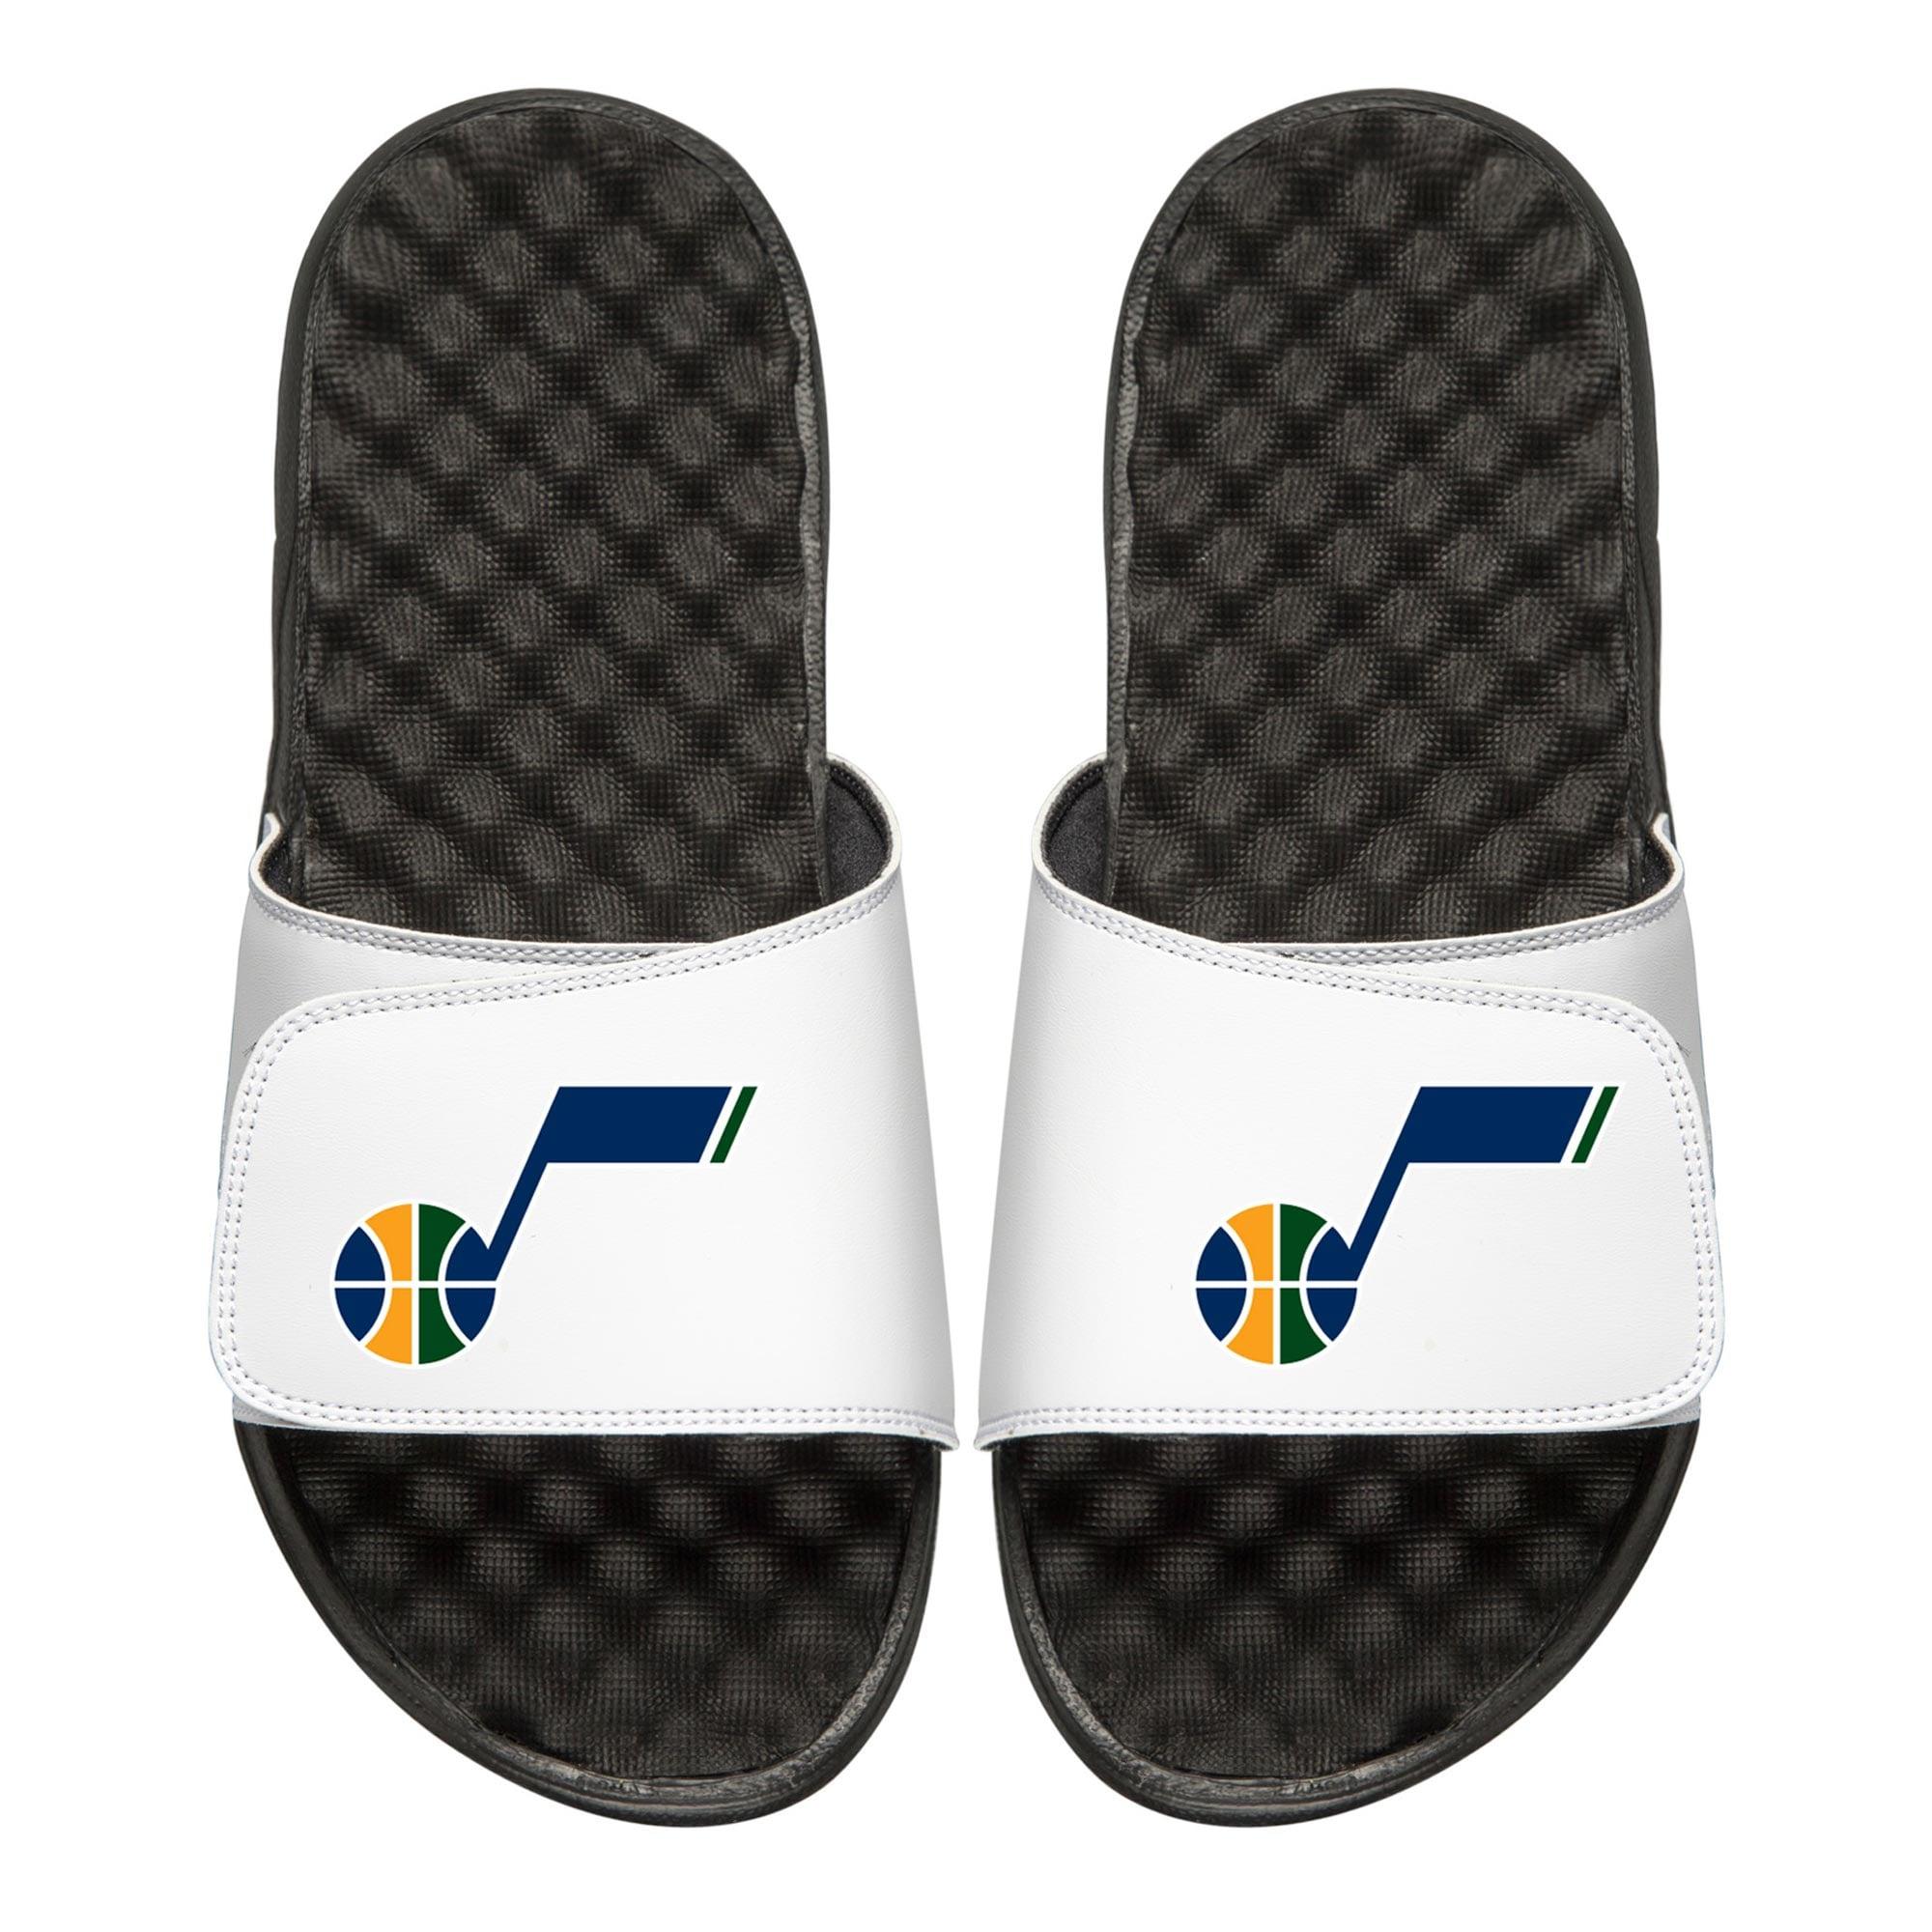 Utah Jazz Youth Primary iSlide Sandals - White